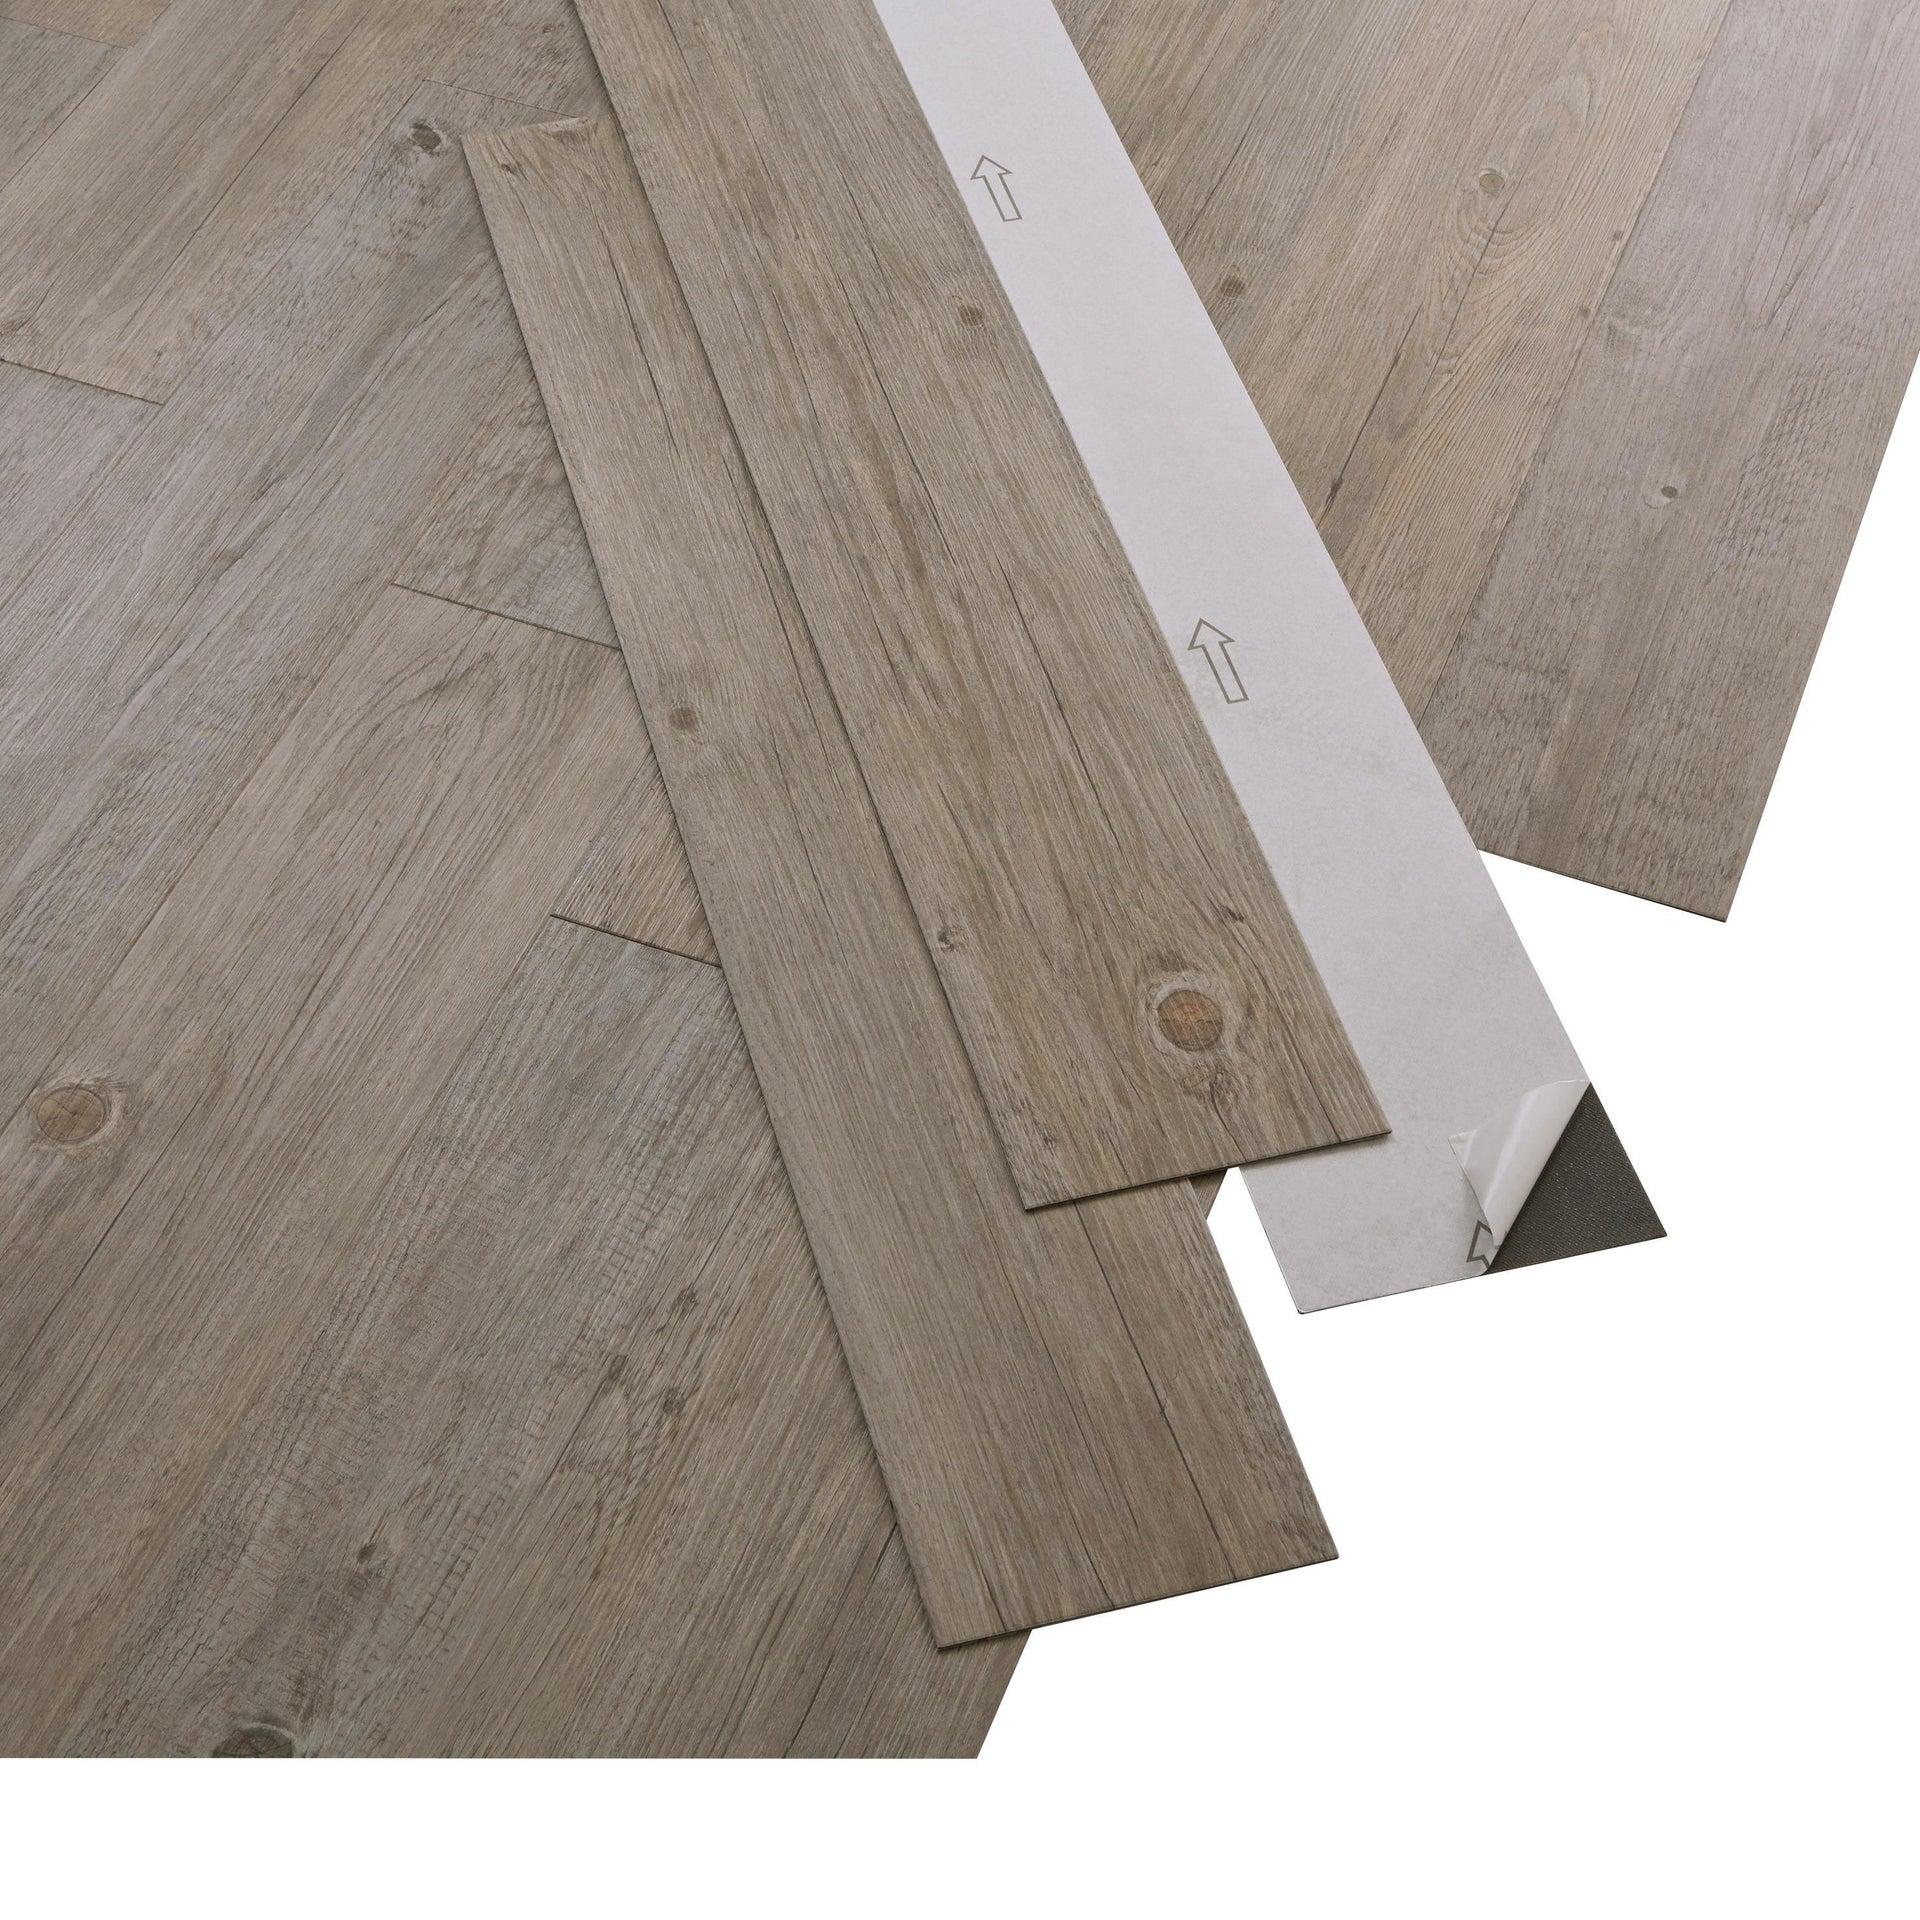 Pavimento PVC adesivo Pecan Sp 2 mm grigio / argento - 2